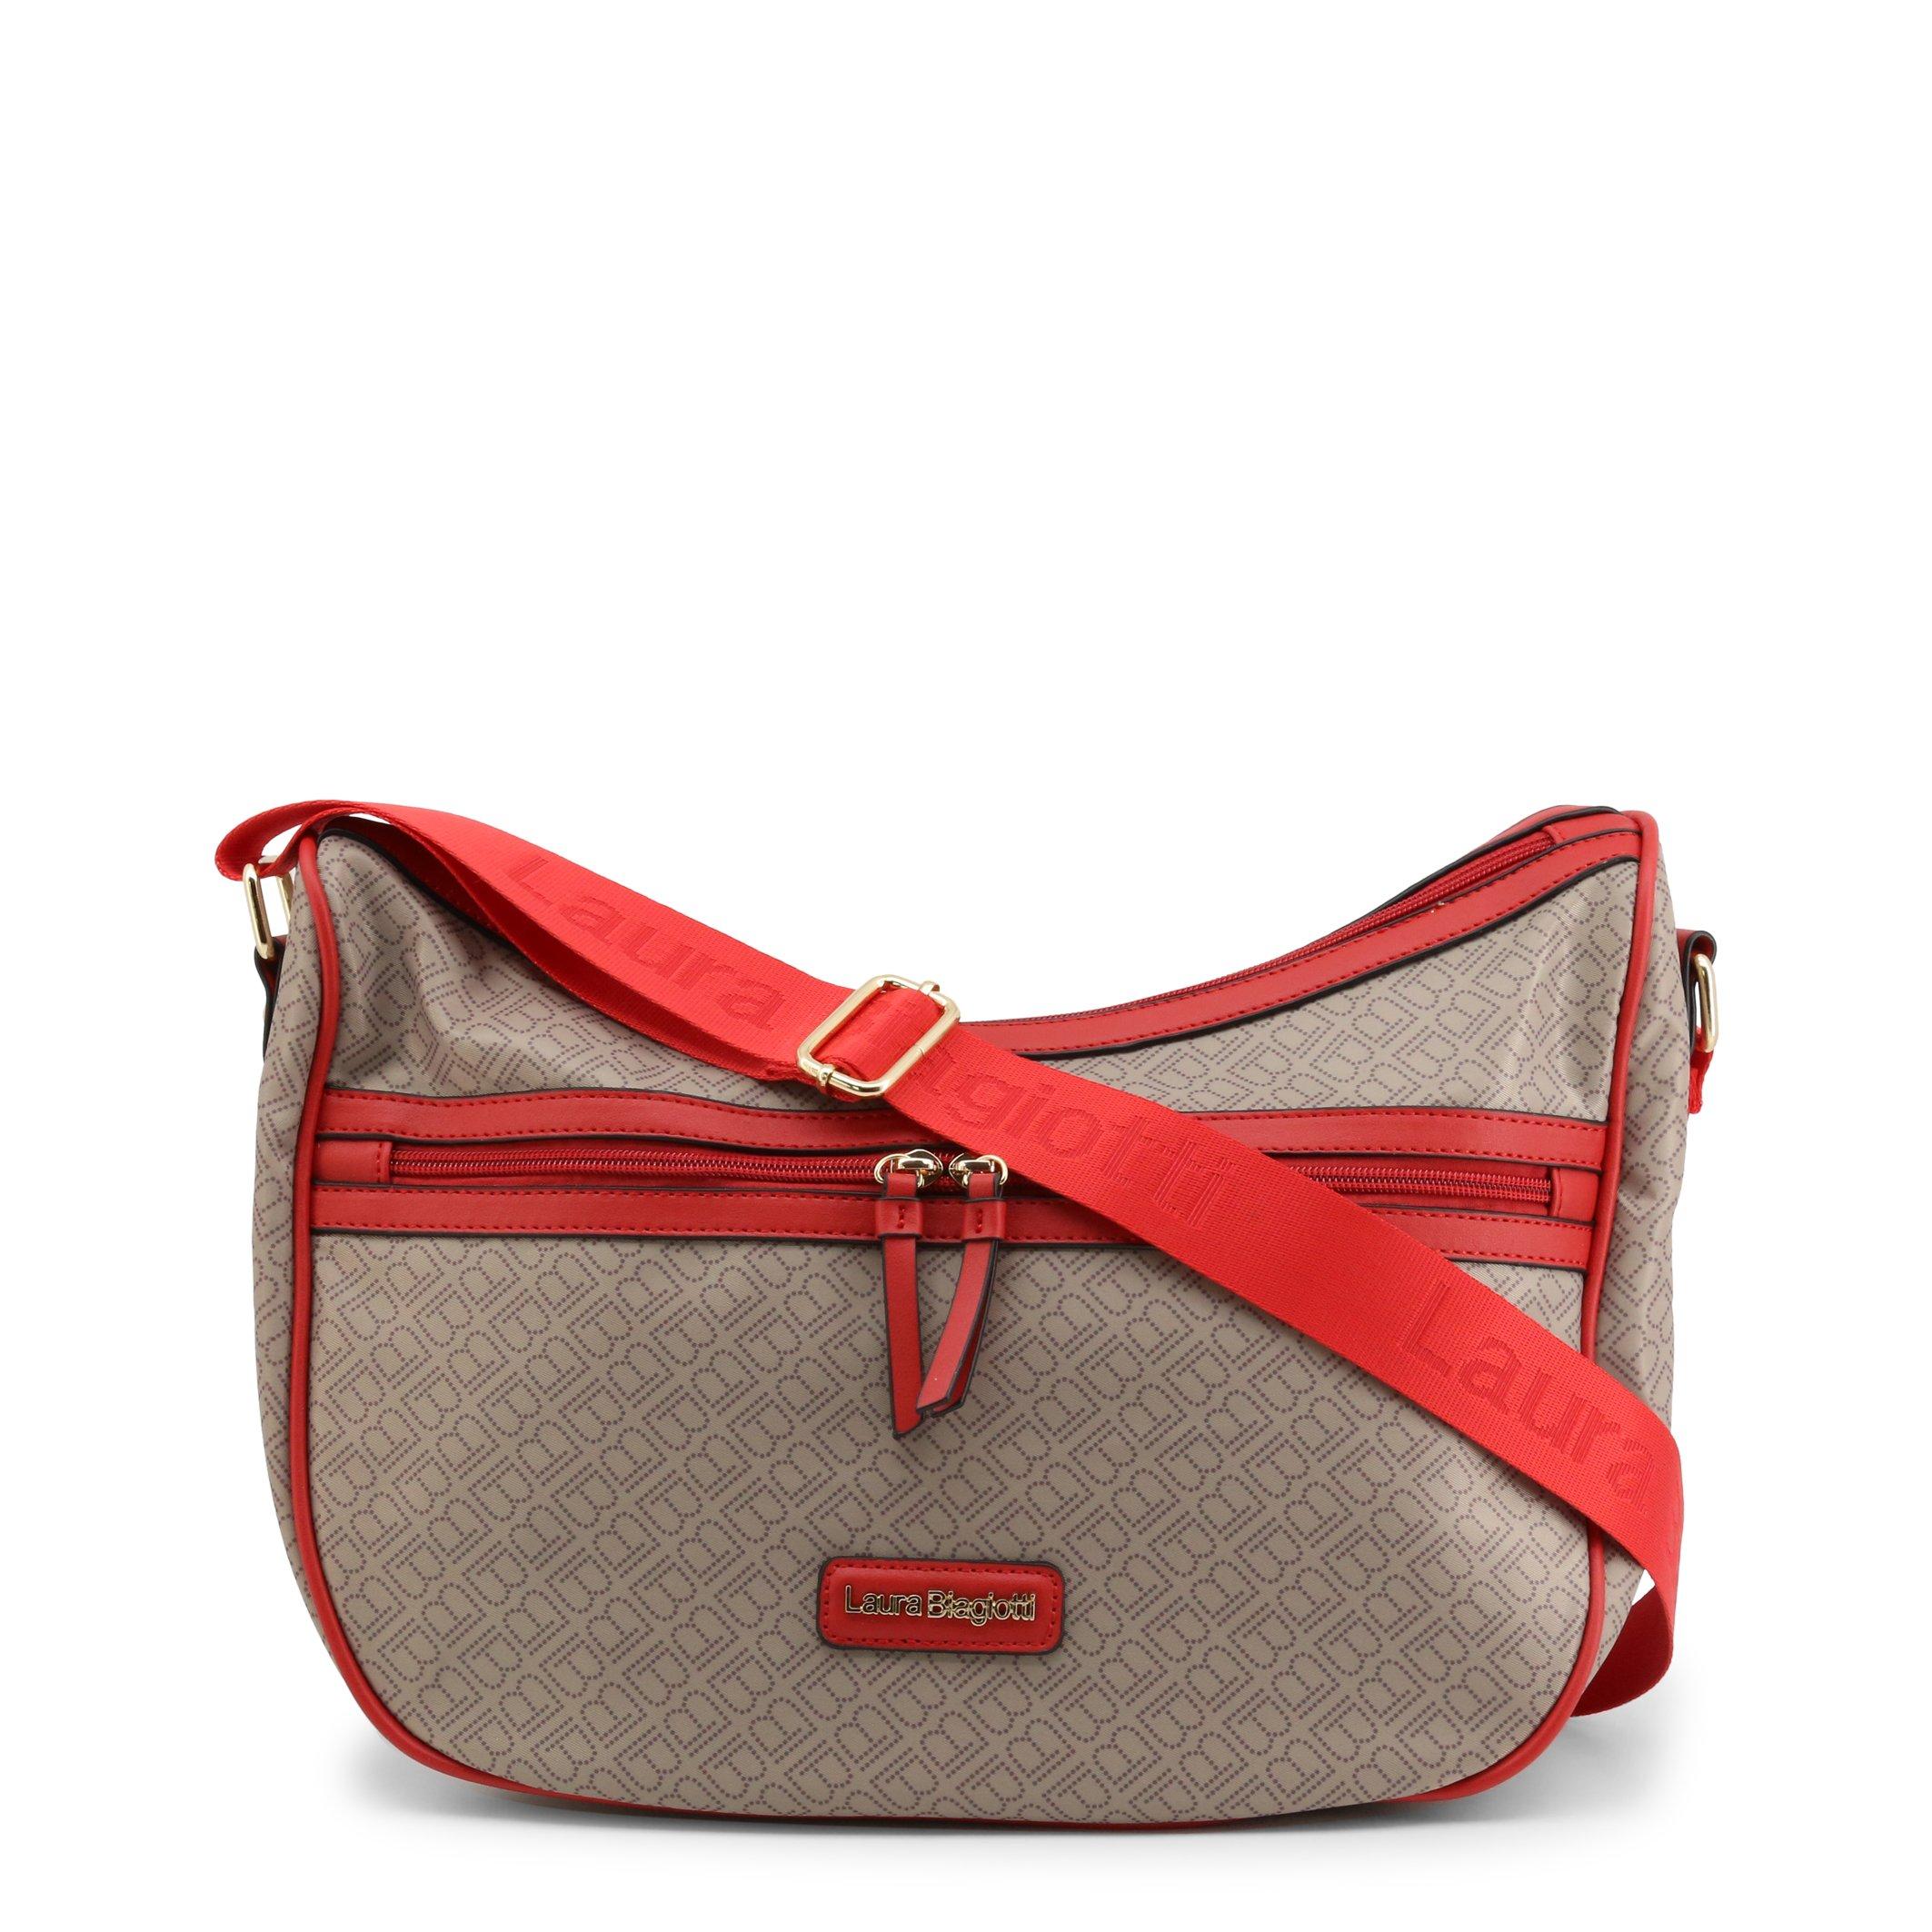 Laura Biagiotti Women's Crossbody Bag Brown Thia-105-11 - brown-3 NOSIZE